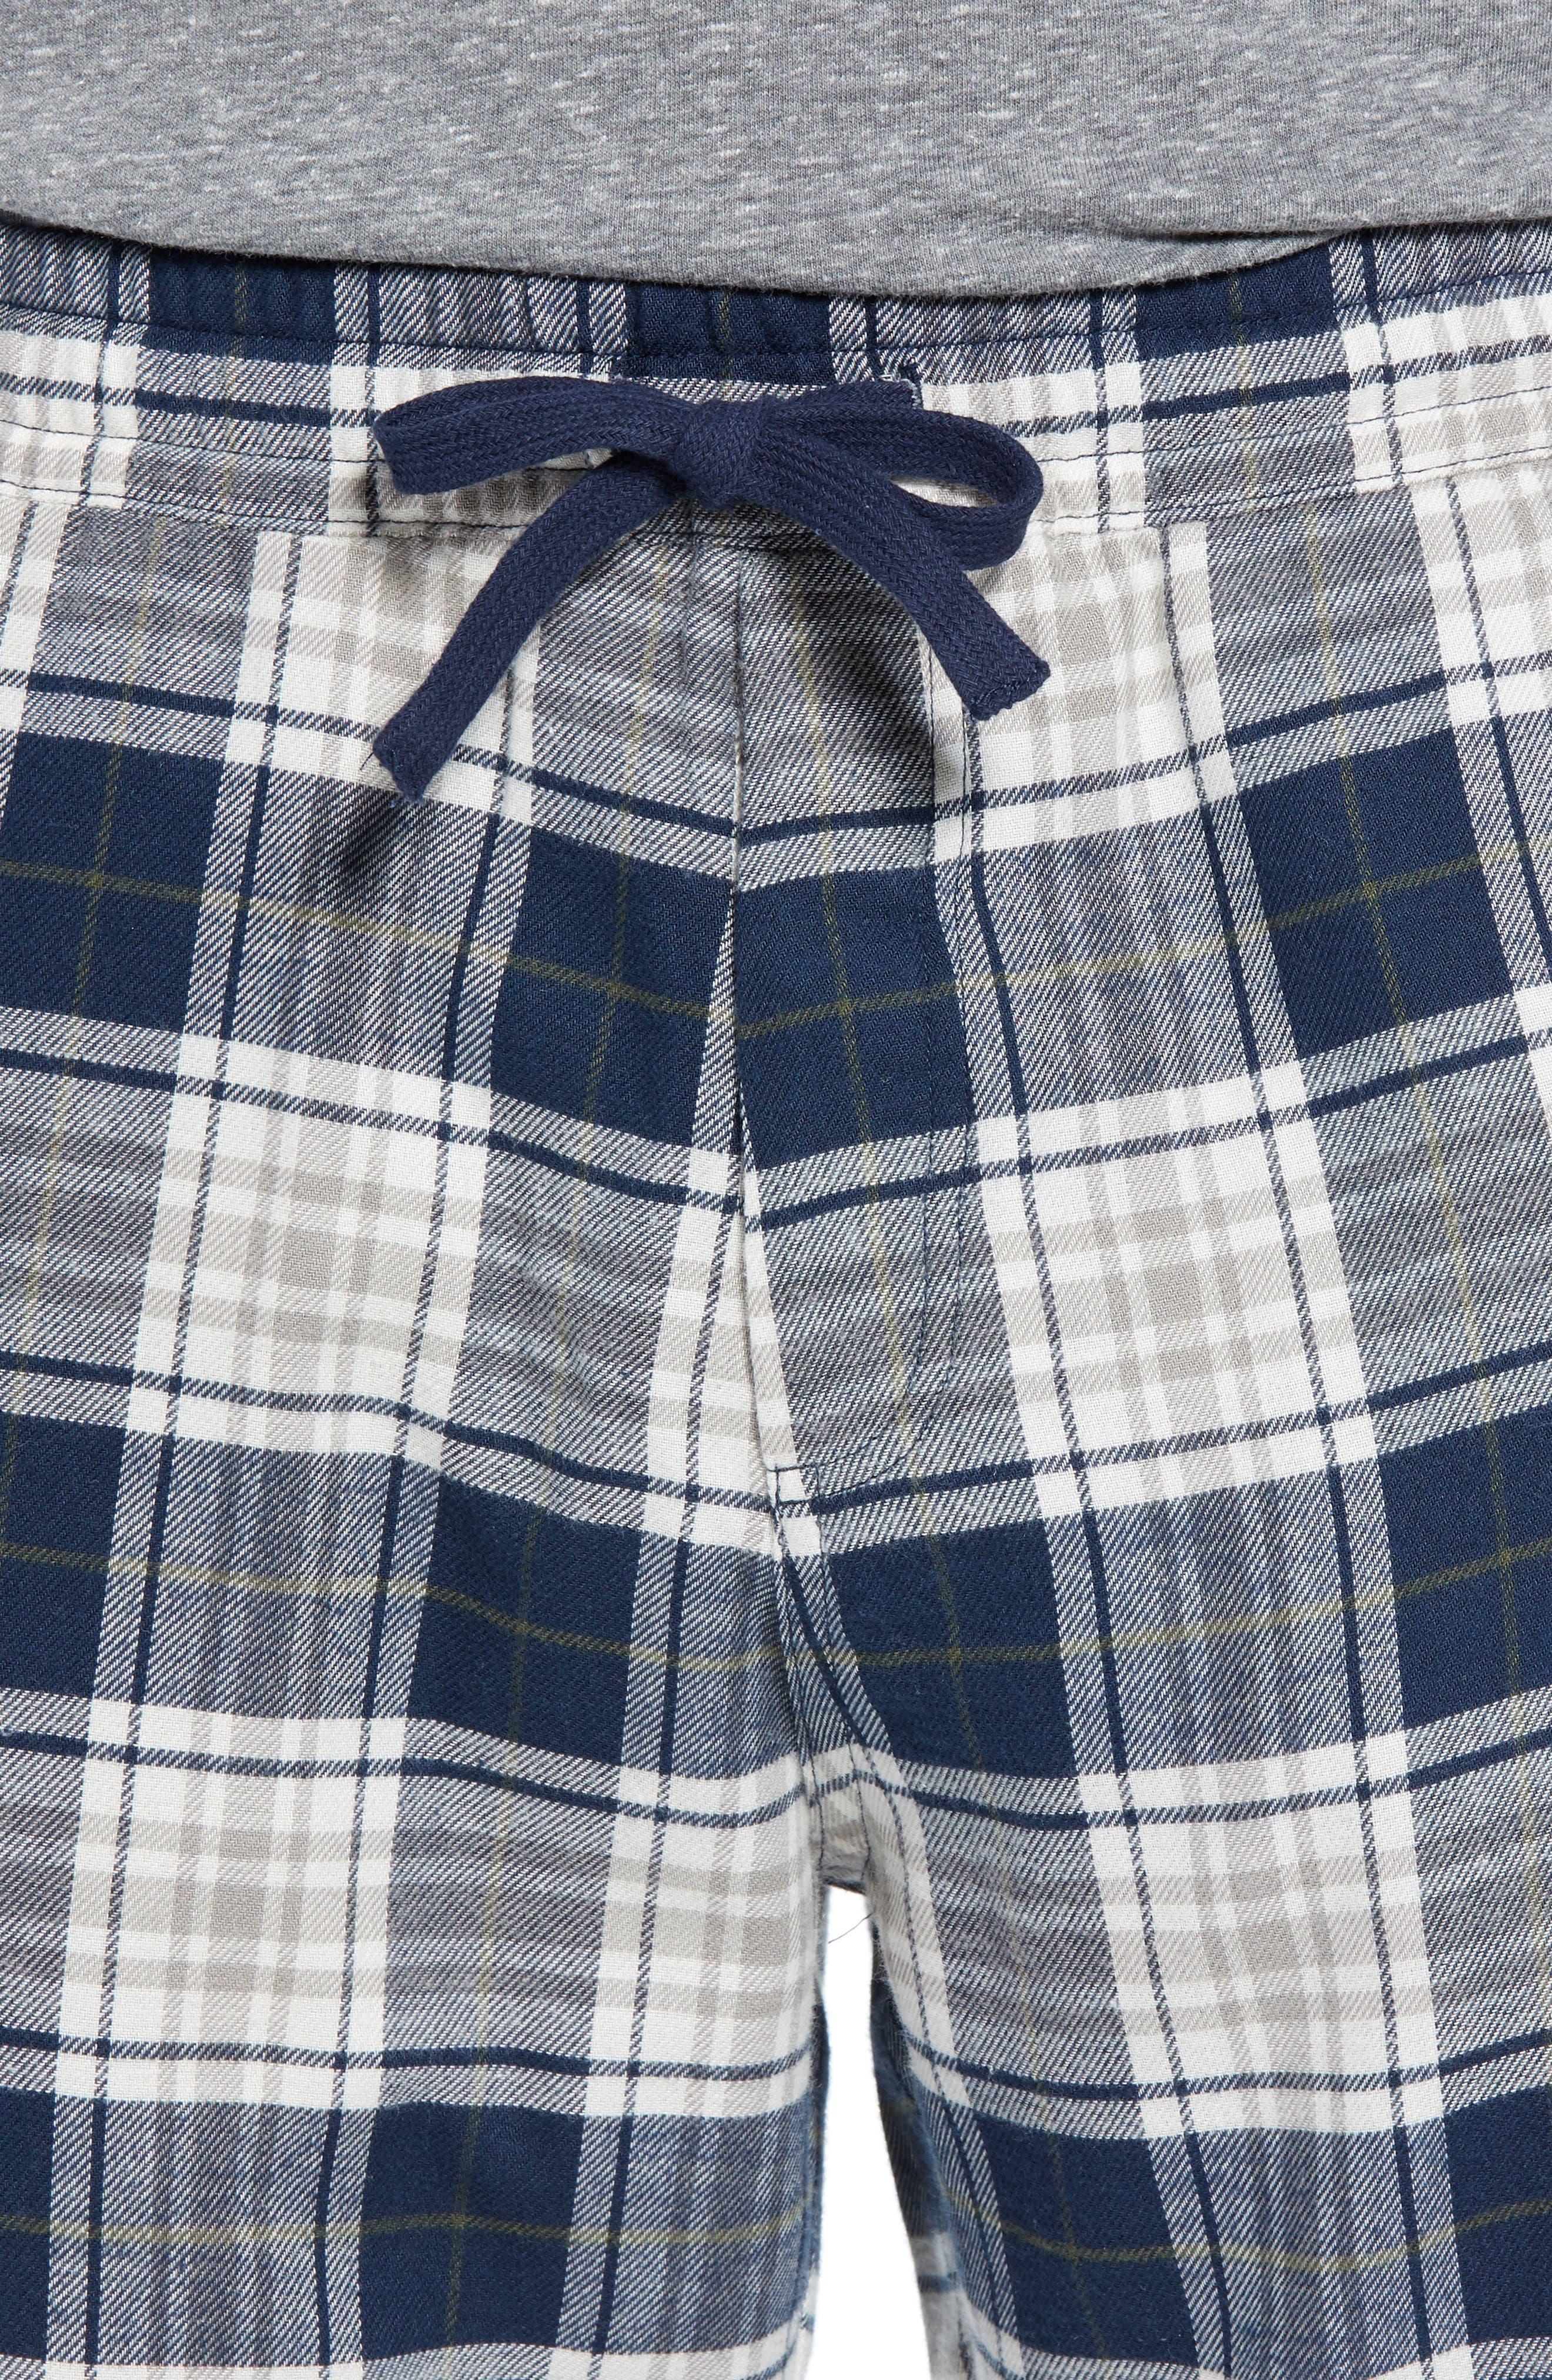 Steiner Pajama Set,                             Alternate thumbnail 4, color,                             NAVY/ GREY HEATHER